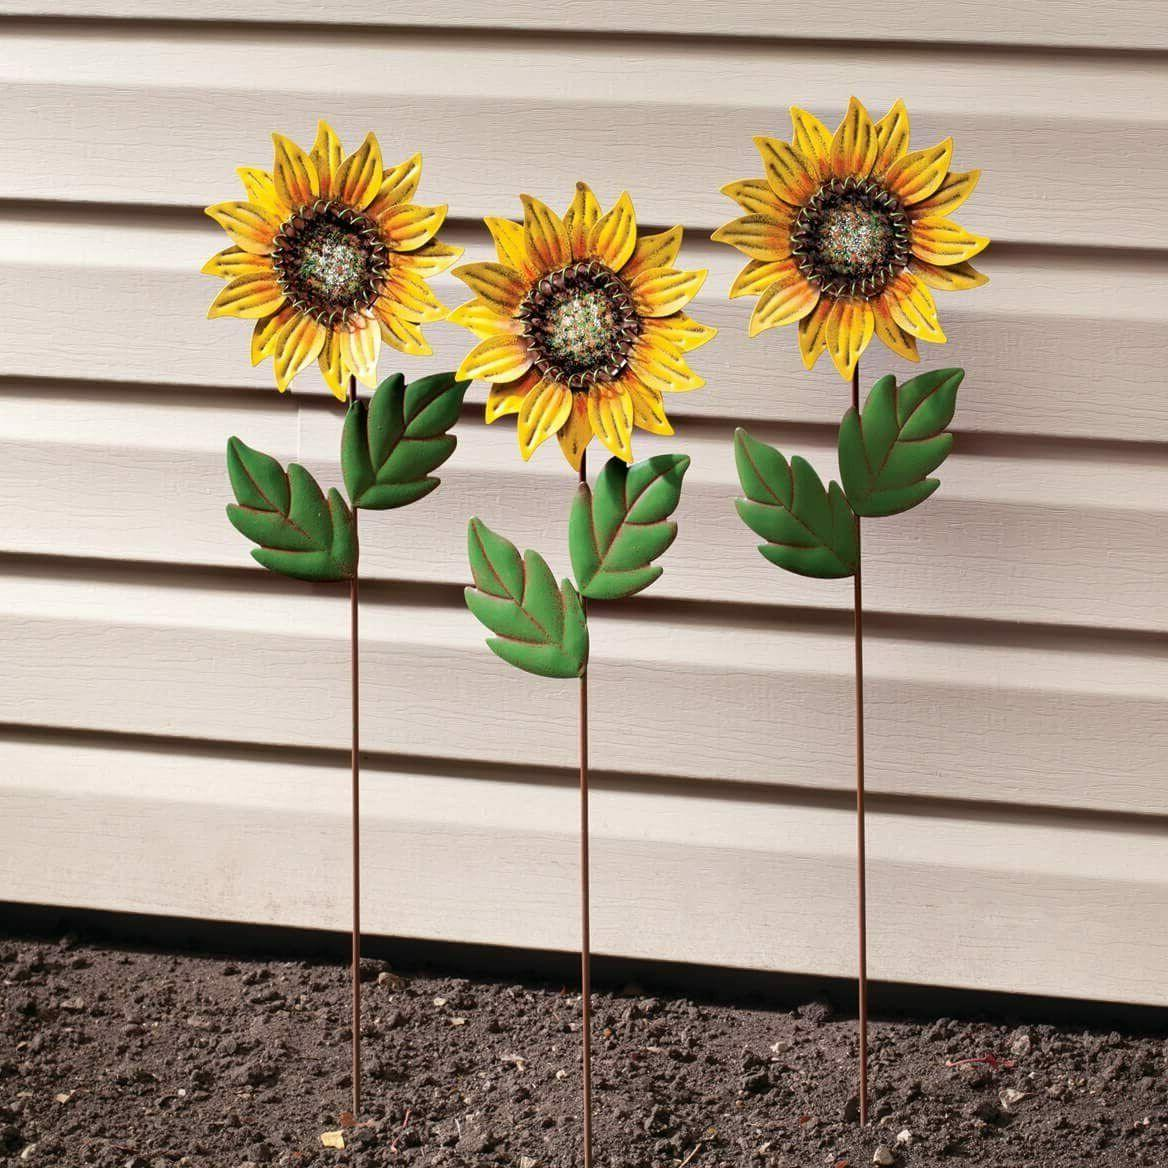 Set of 3 Metal Sunflower Yard Art Outdoor Garden Decor Plant